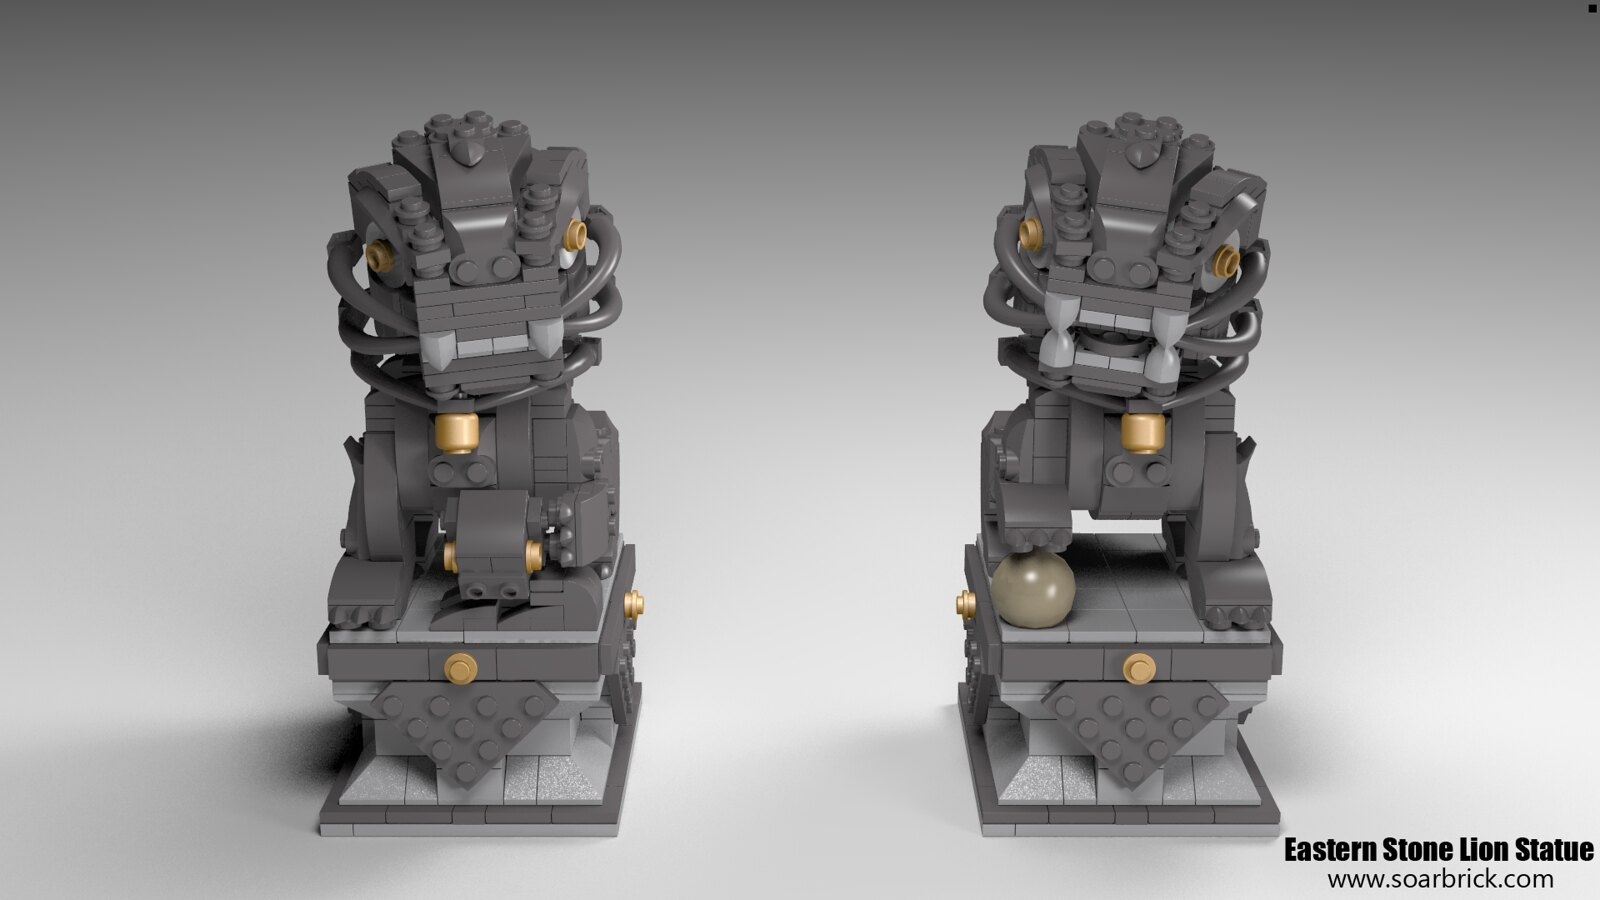 Custom instruction Eastern Stone Lion Statue consisting of LEGO elements